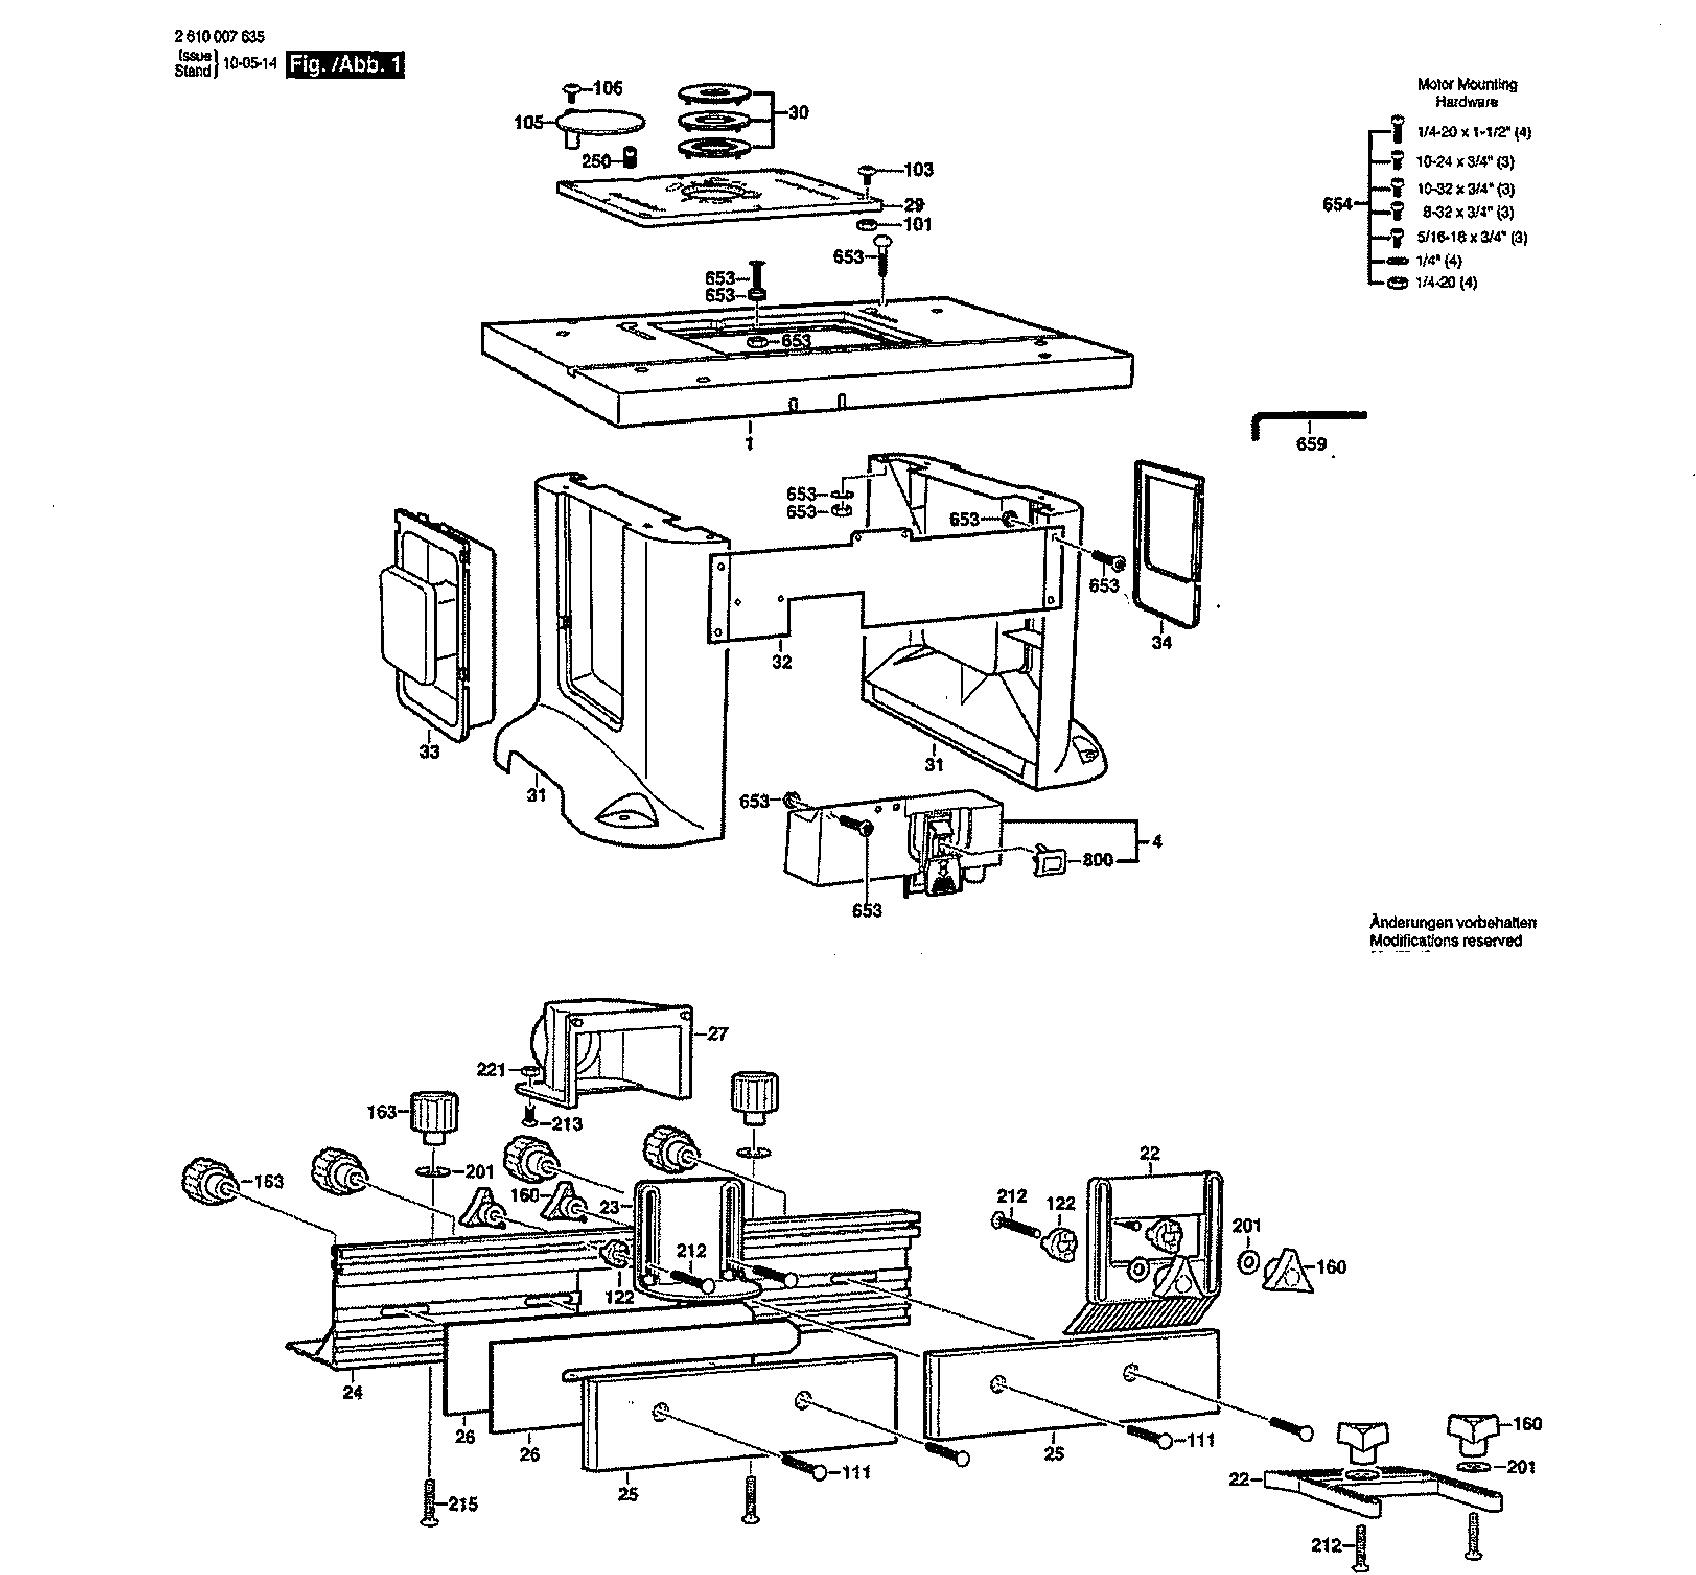 Bosch model RA1181 router accessory genuine parts